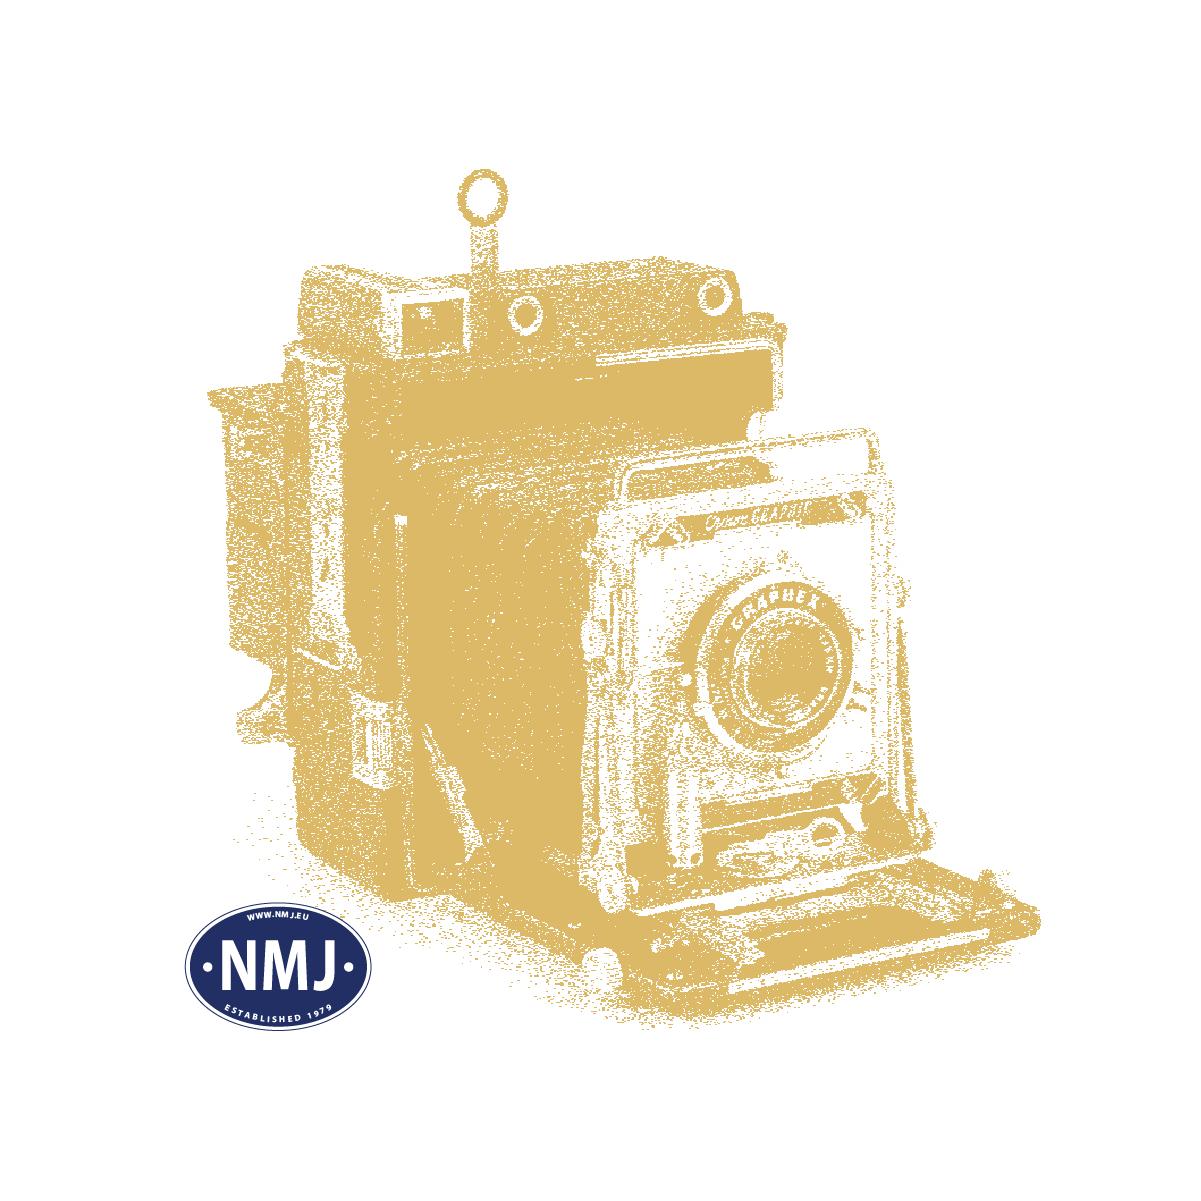 "NMJT610.301 - NMJ Topline Ibblps 820 0 374-0 ""Findus"" Interfrigo"